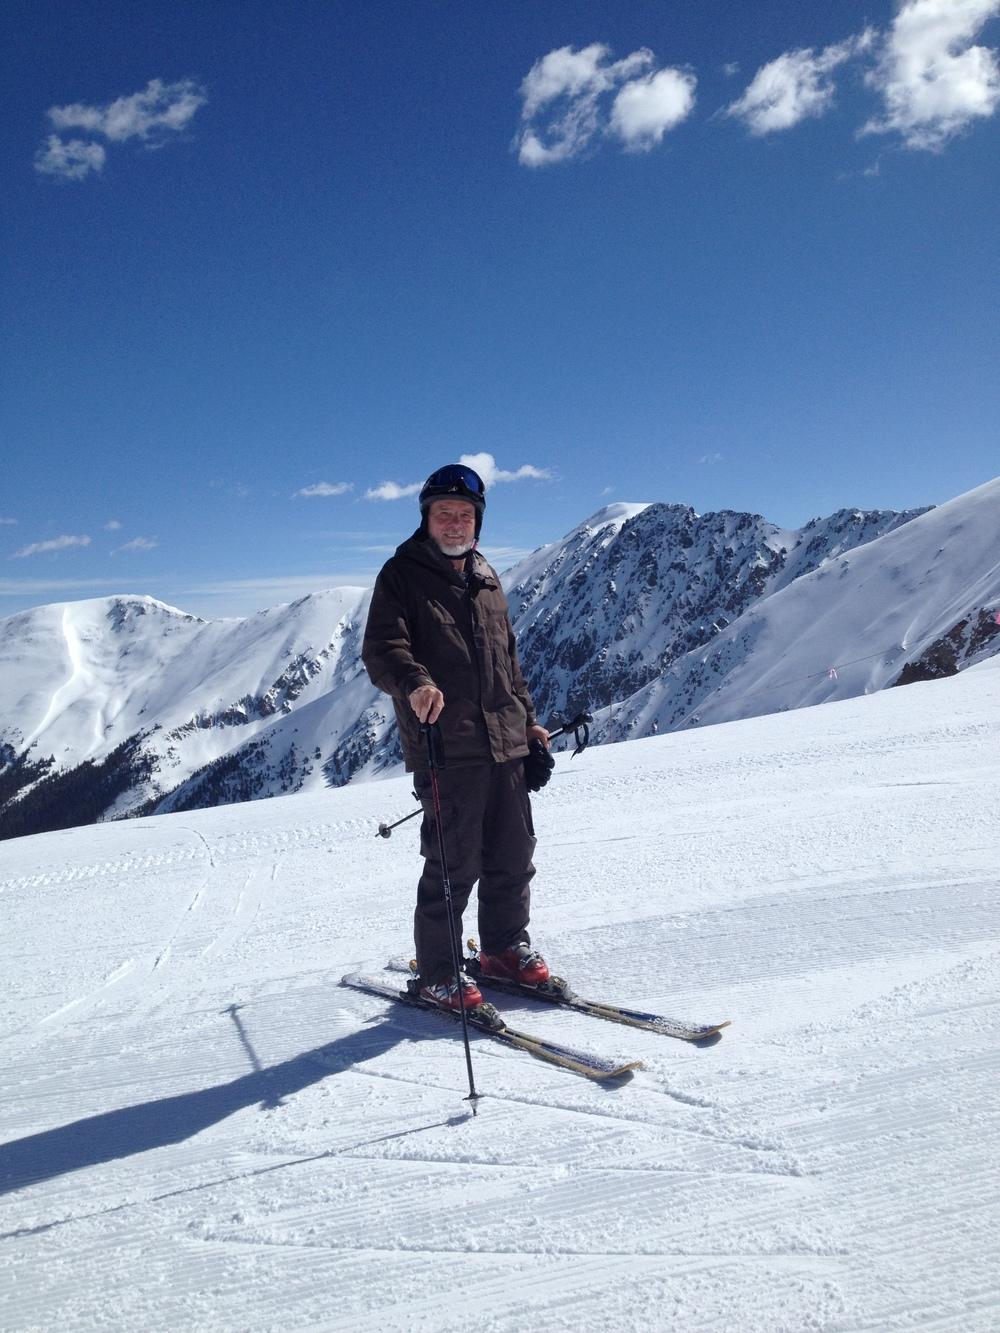 Bob skiing Arapahoe Basin